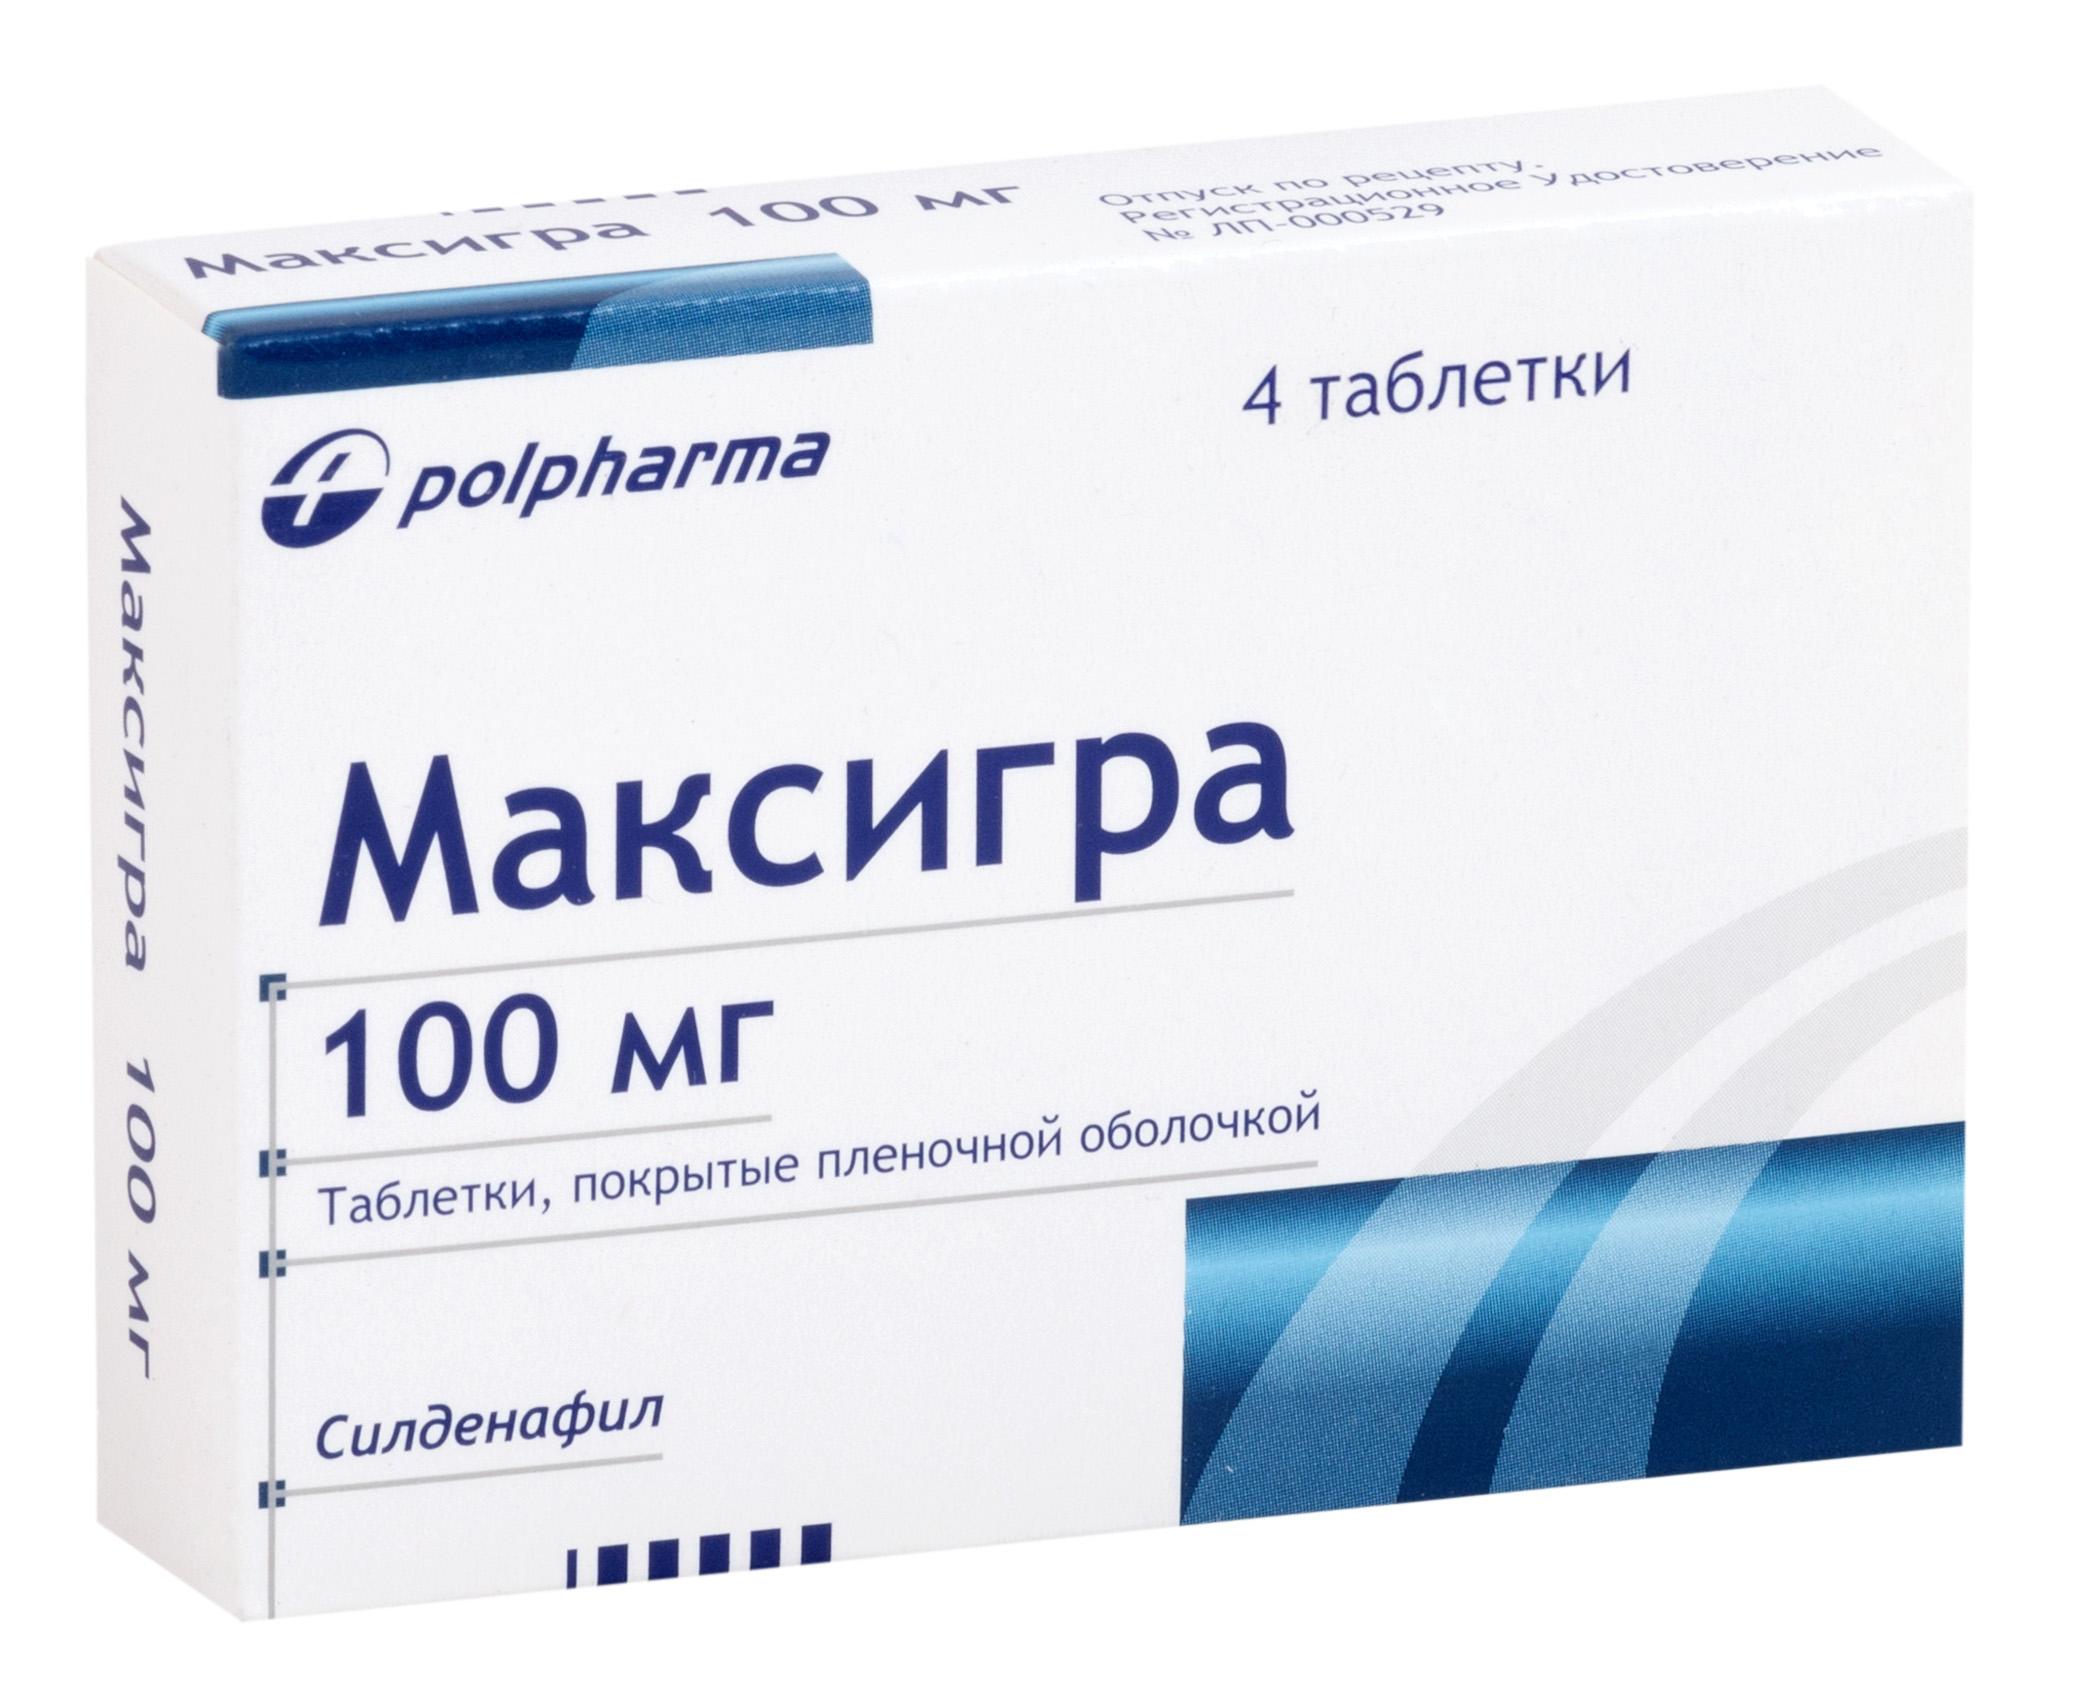 Максигра таб. п.п.о. 100мг n4